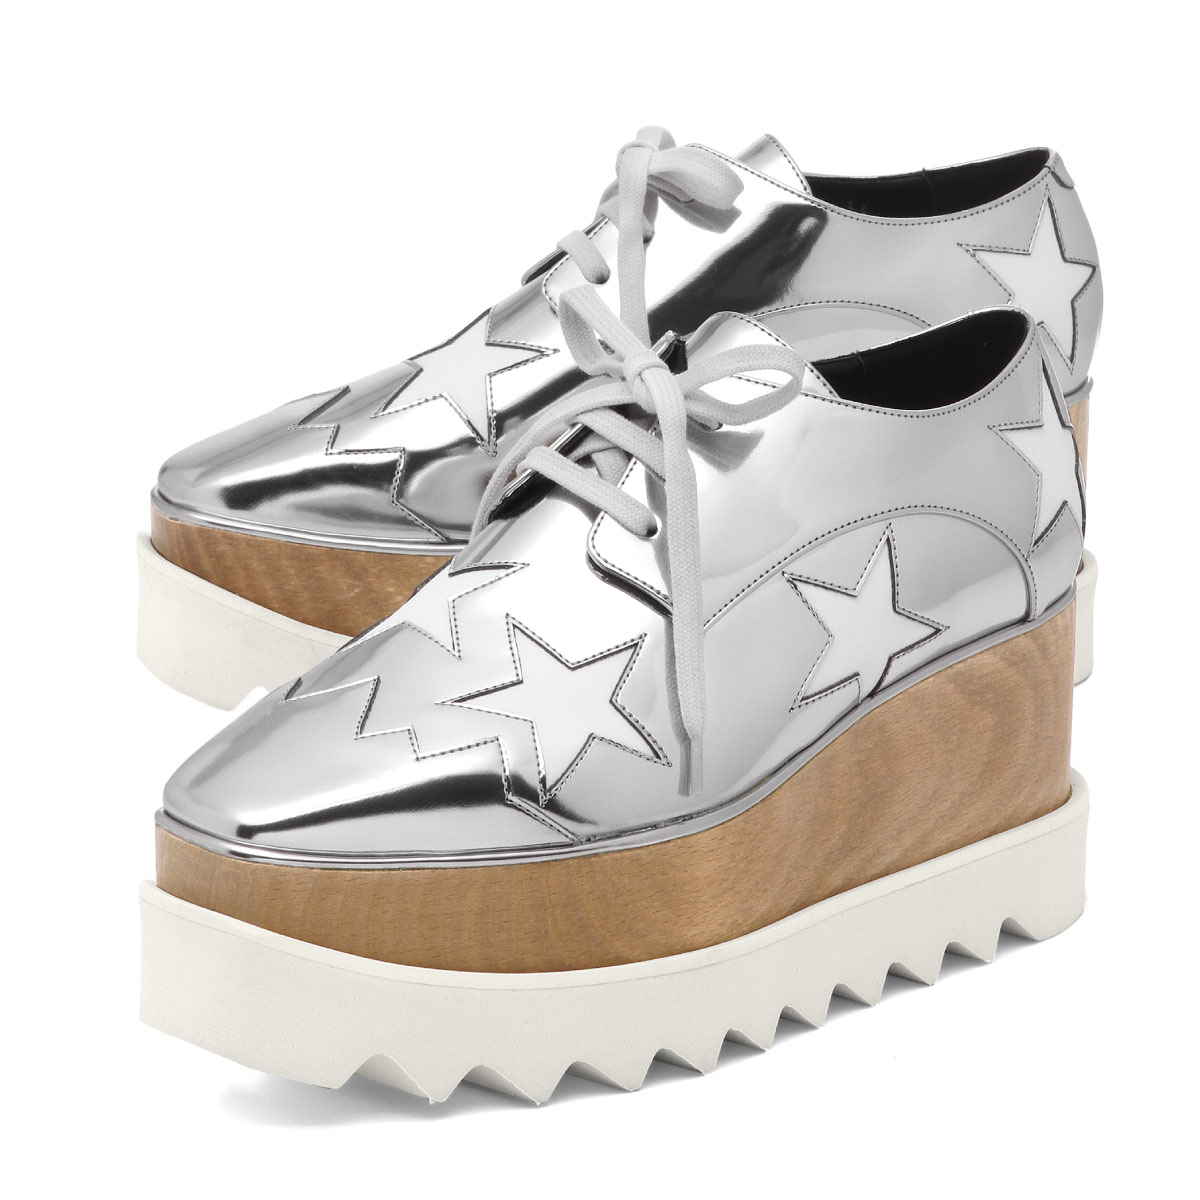 02f5dc51ad1a Stella McCartney STELLA McCARTNEY shoes Lady s 363998 W0ZR5 8171 sneakers  ELYSE STAR Ellis star INDIUM WHITE silver